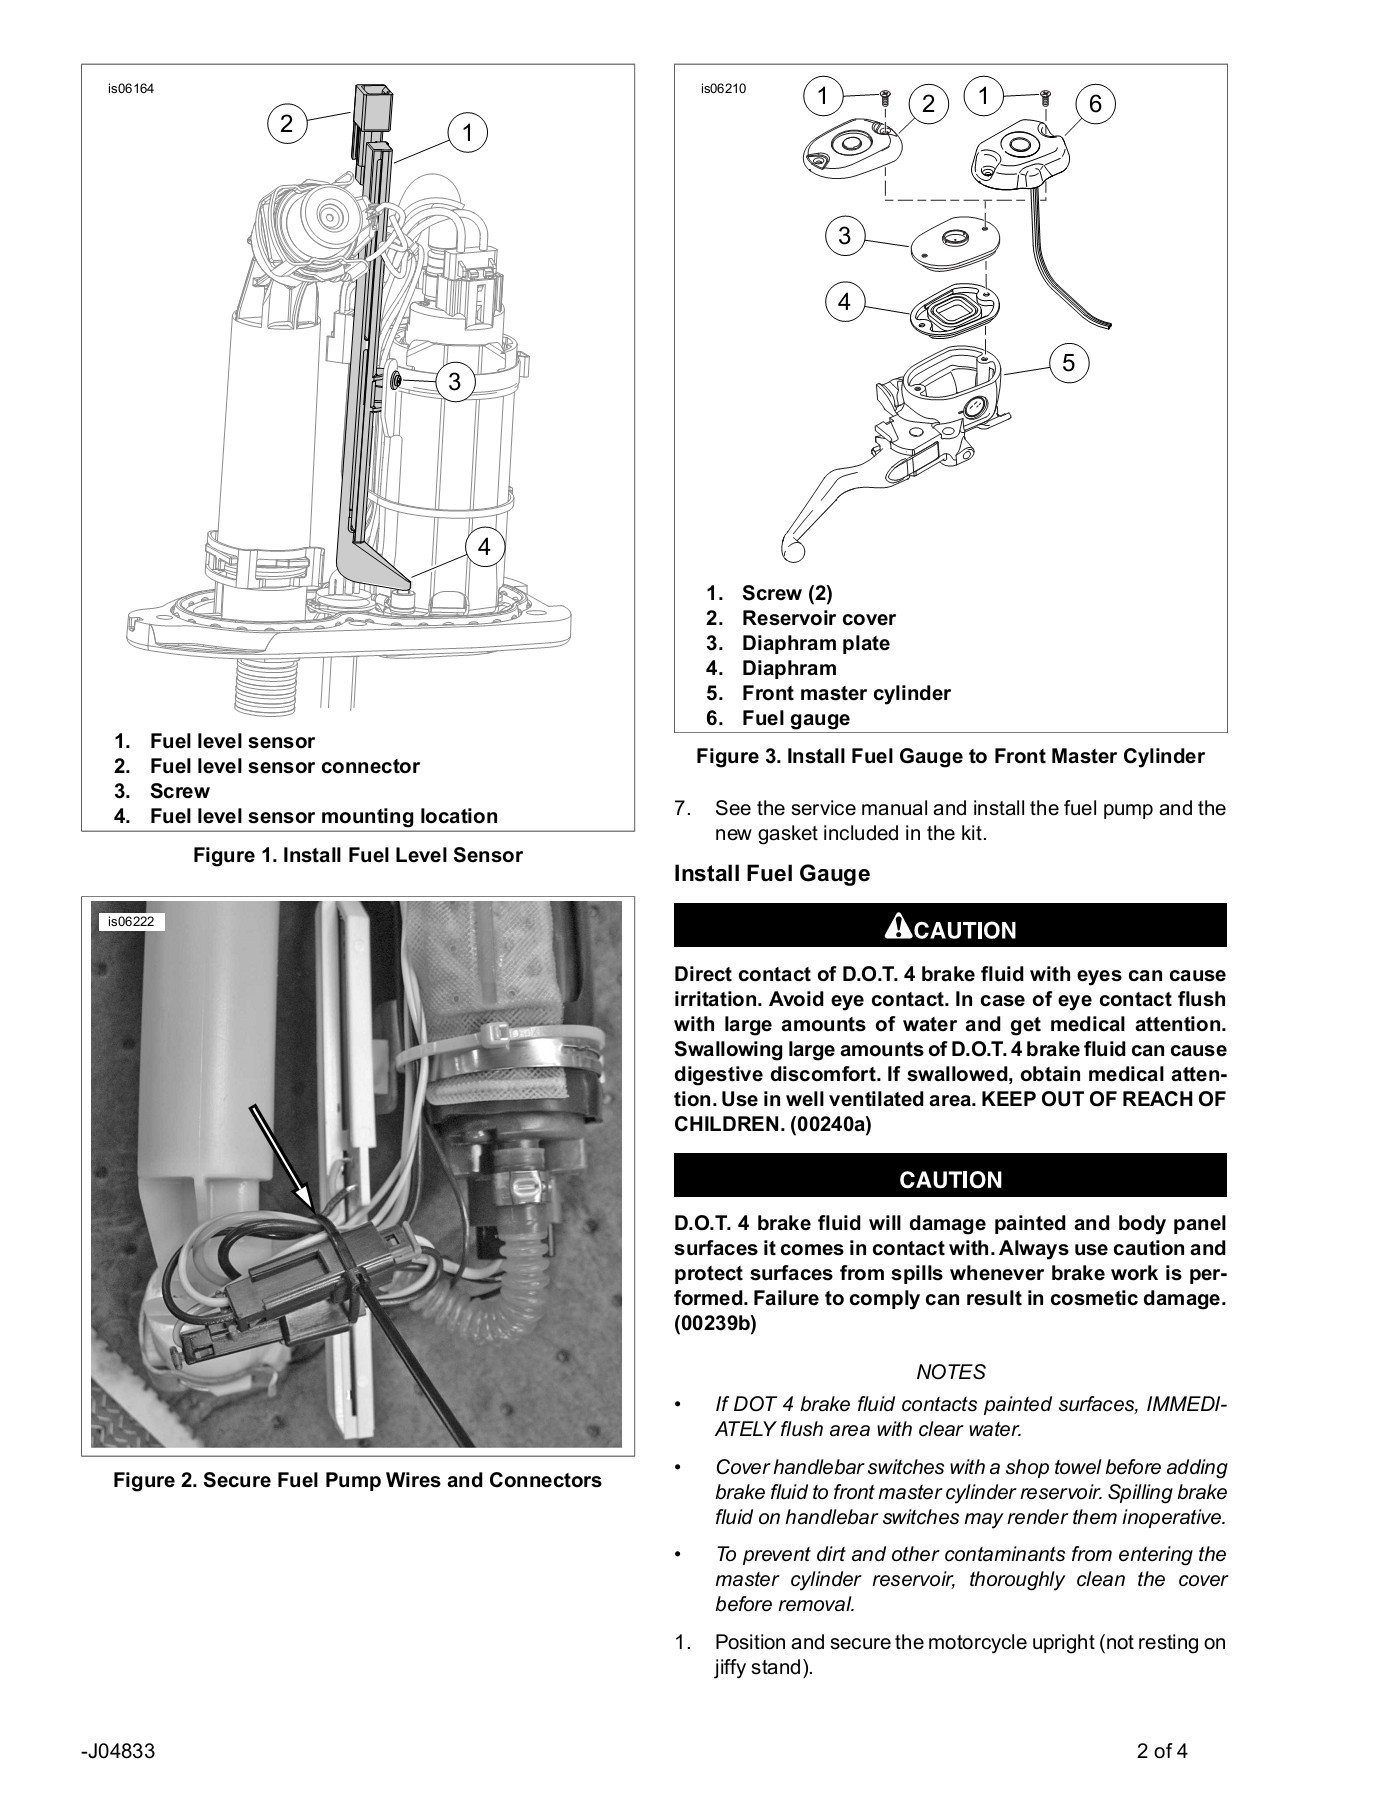 hight resolution of sportster fuel gauge harley davidson pages 1 4 text version fliphtml5